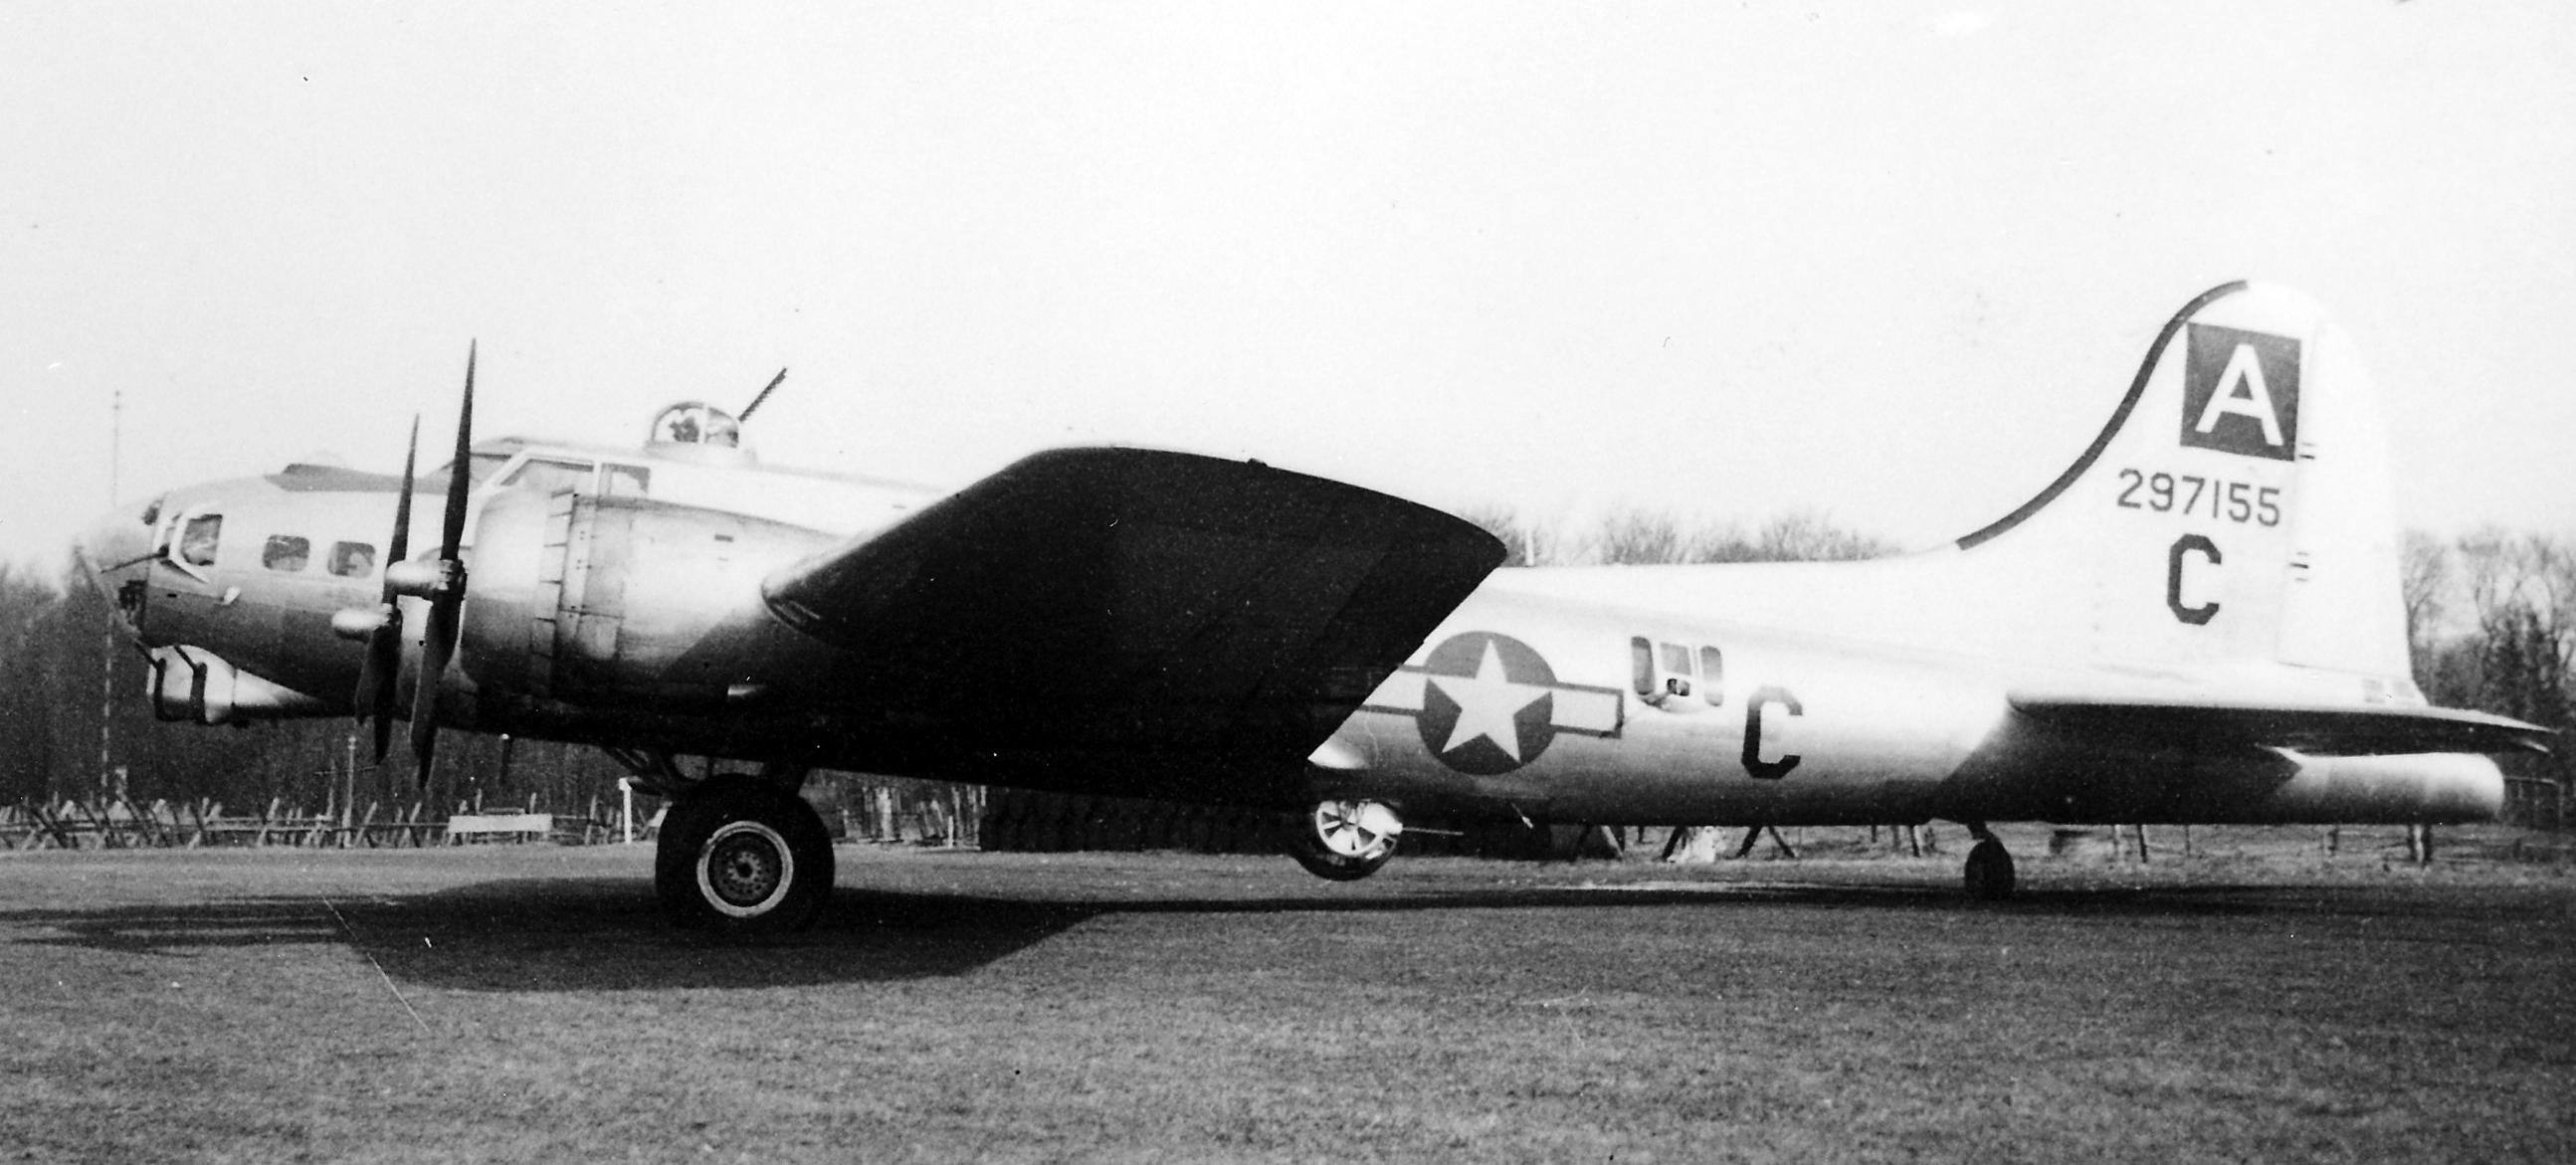 B-17 #42-97155